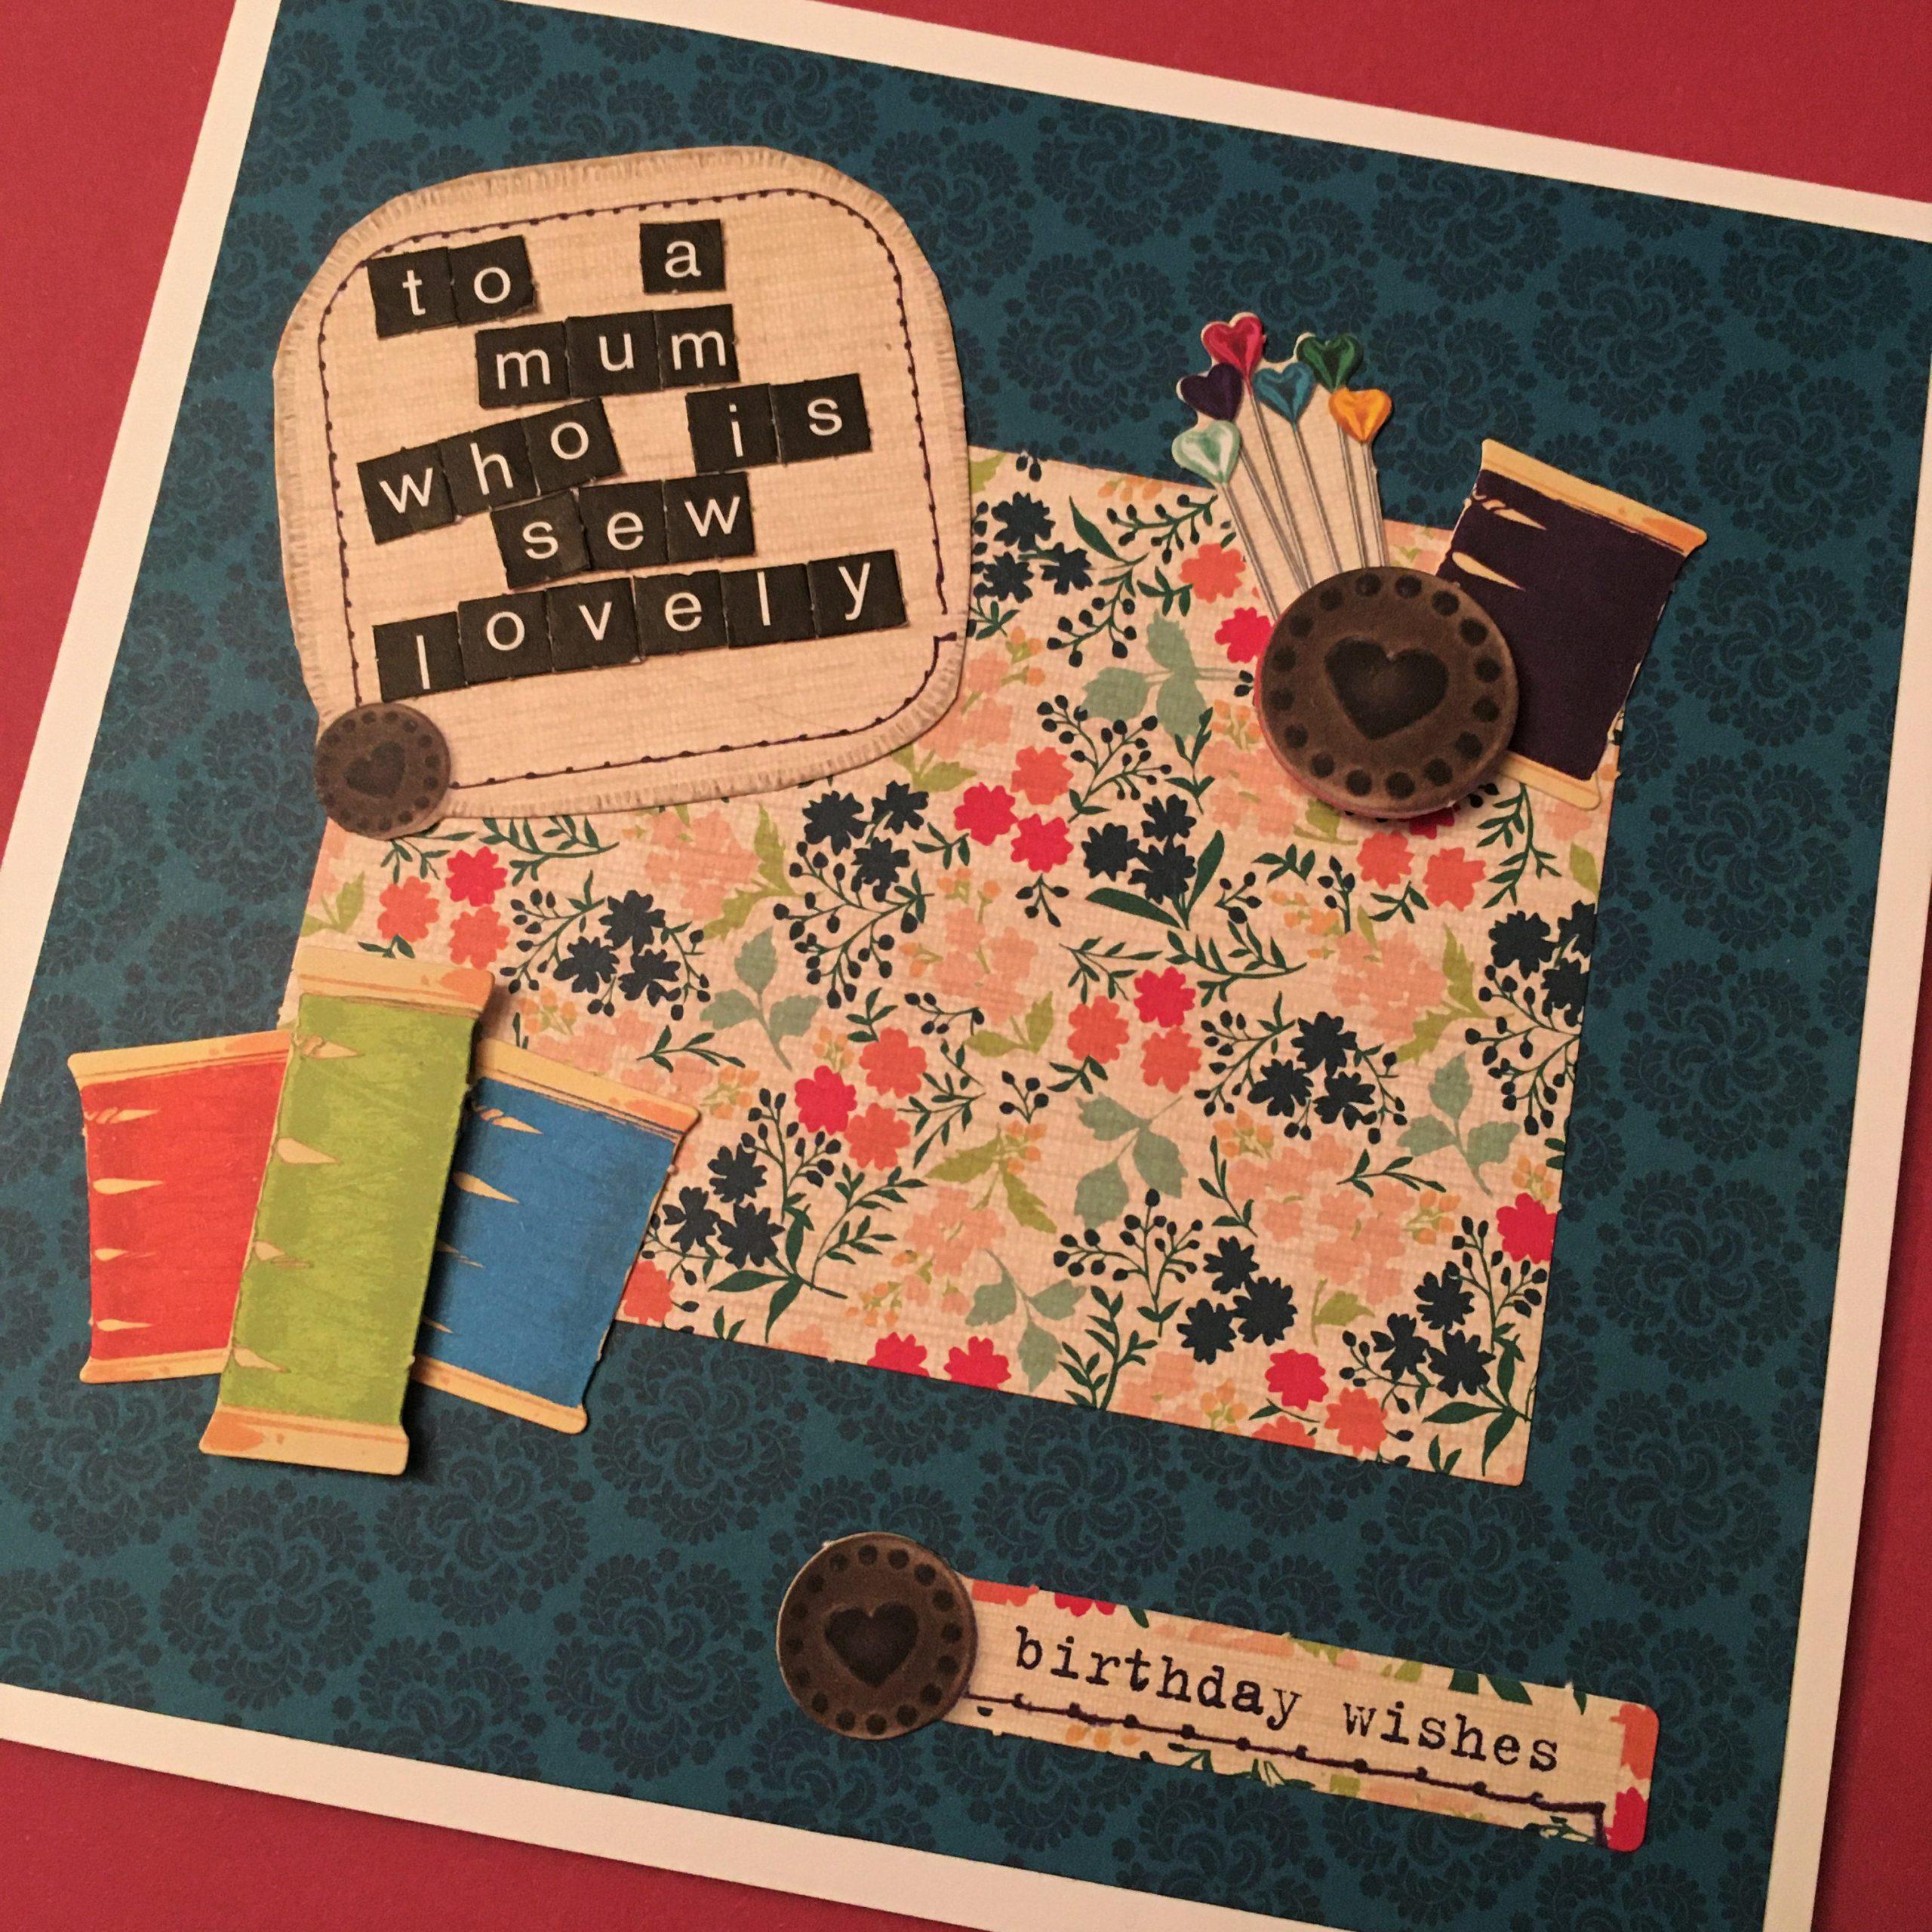 Sewing themed handmade birthday card